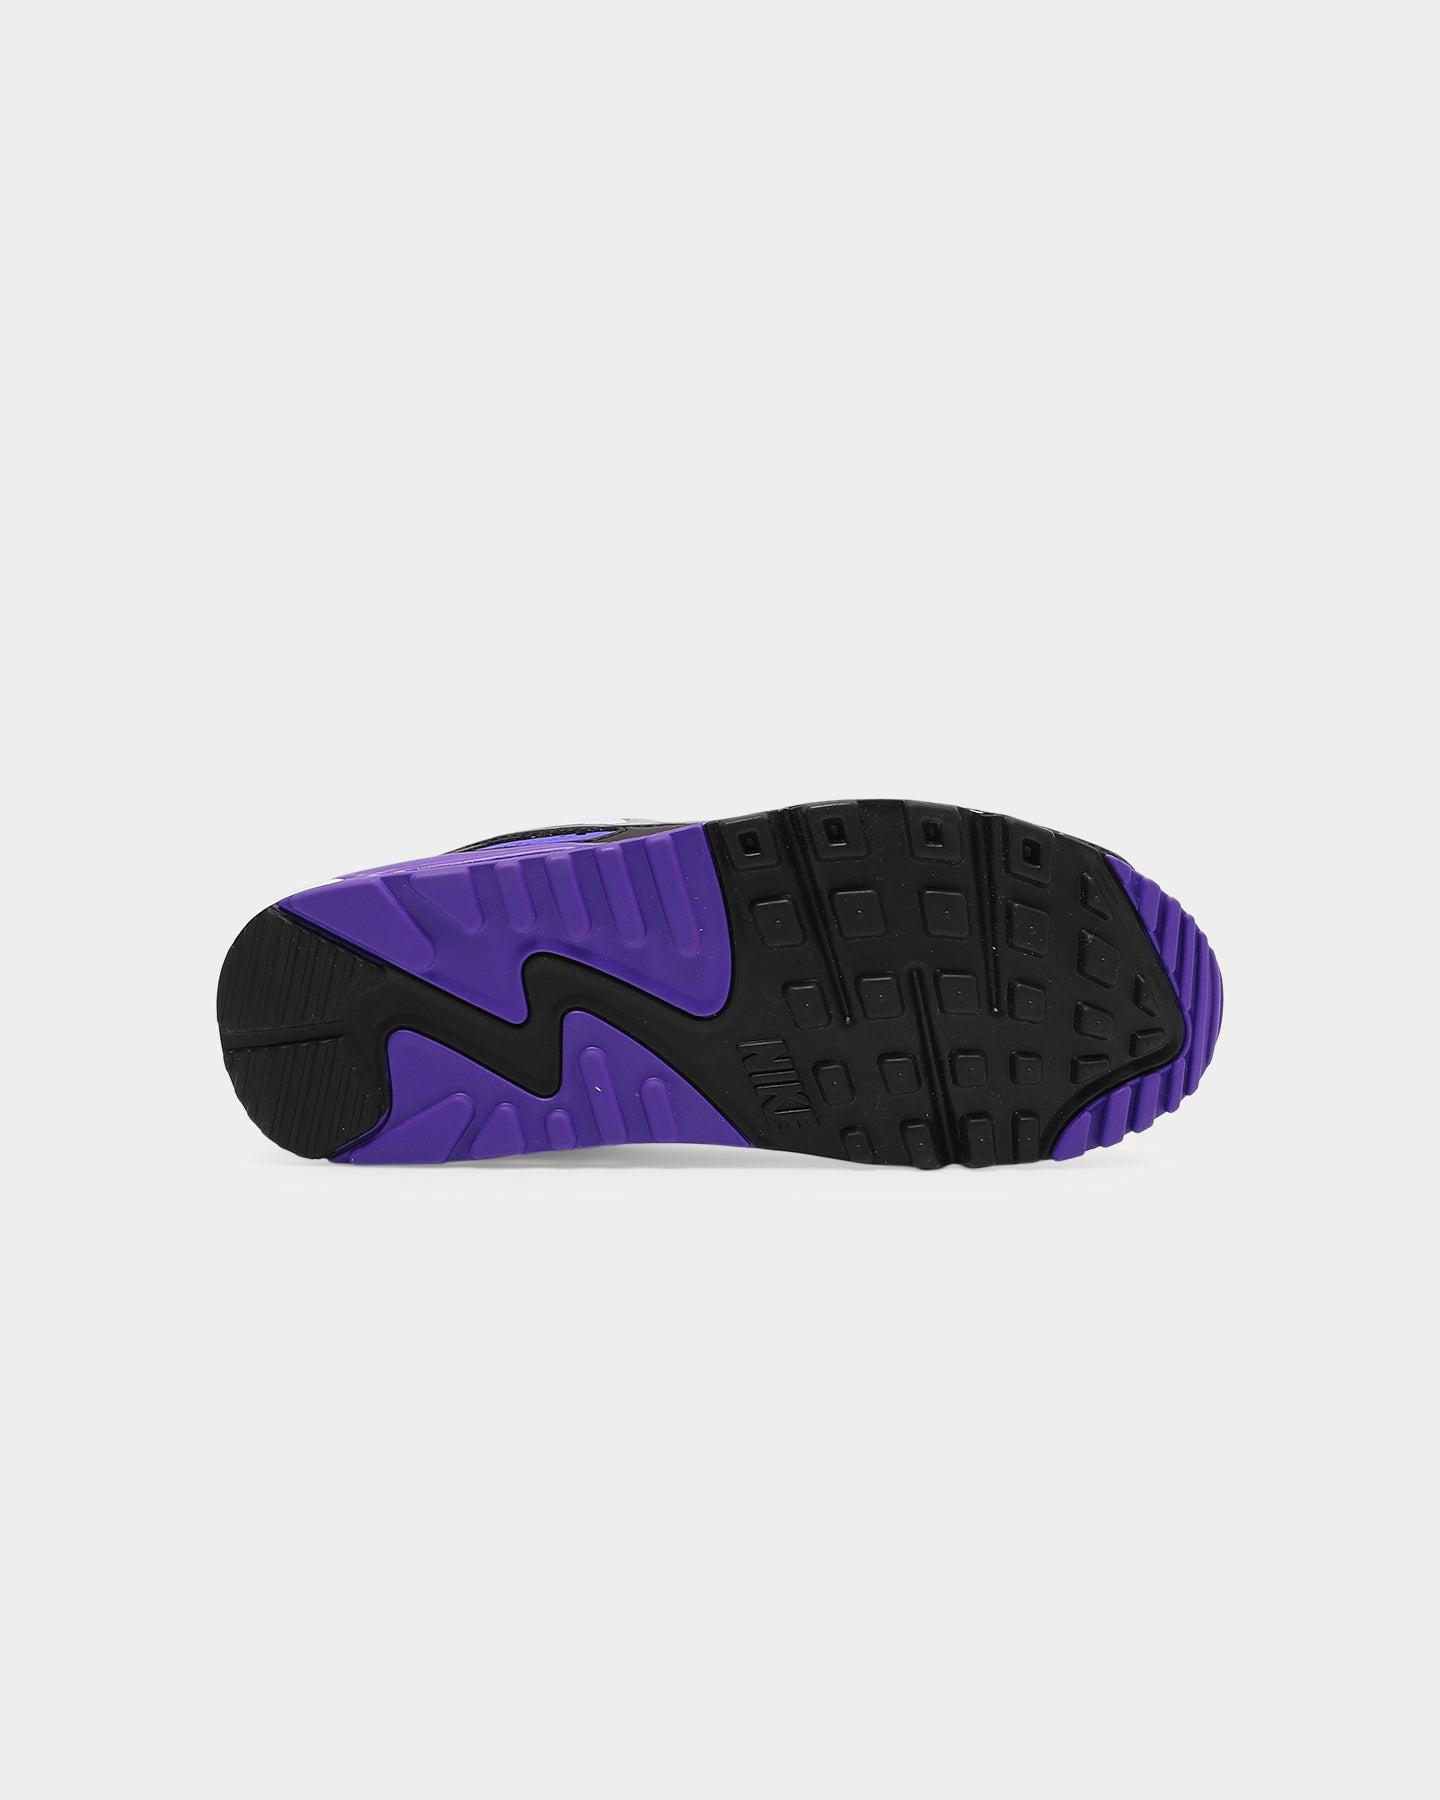 nike air max 90s womens block magenta colourway